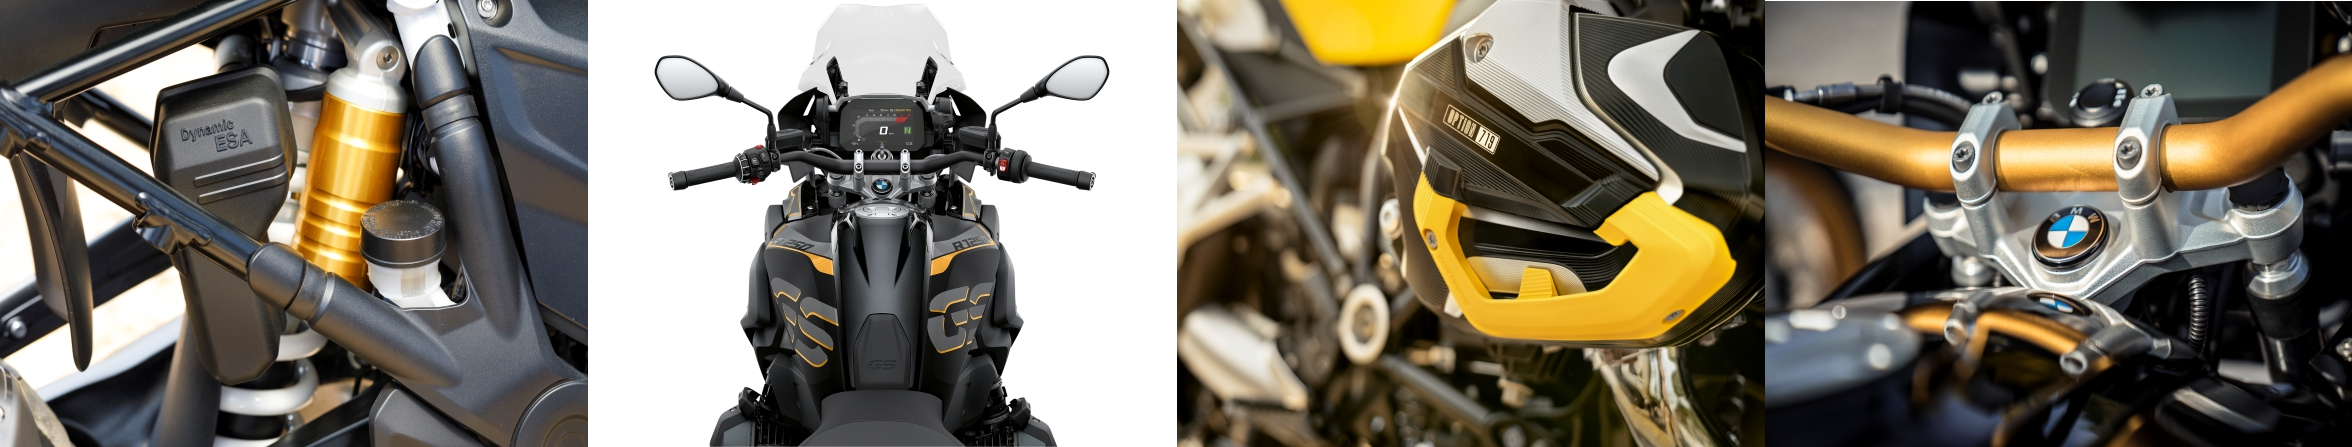 Premium class motorcycles